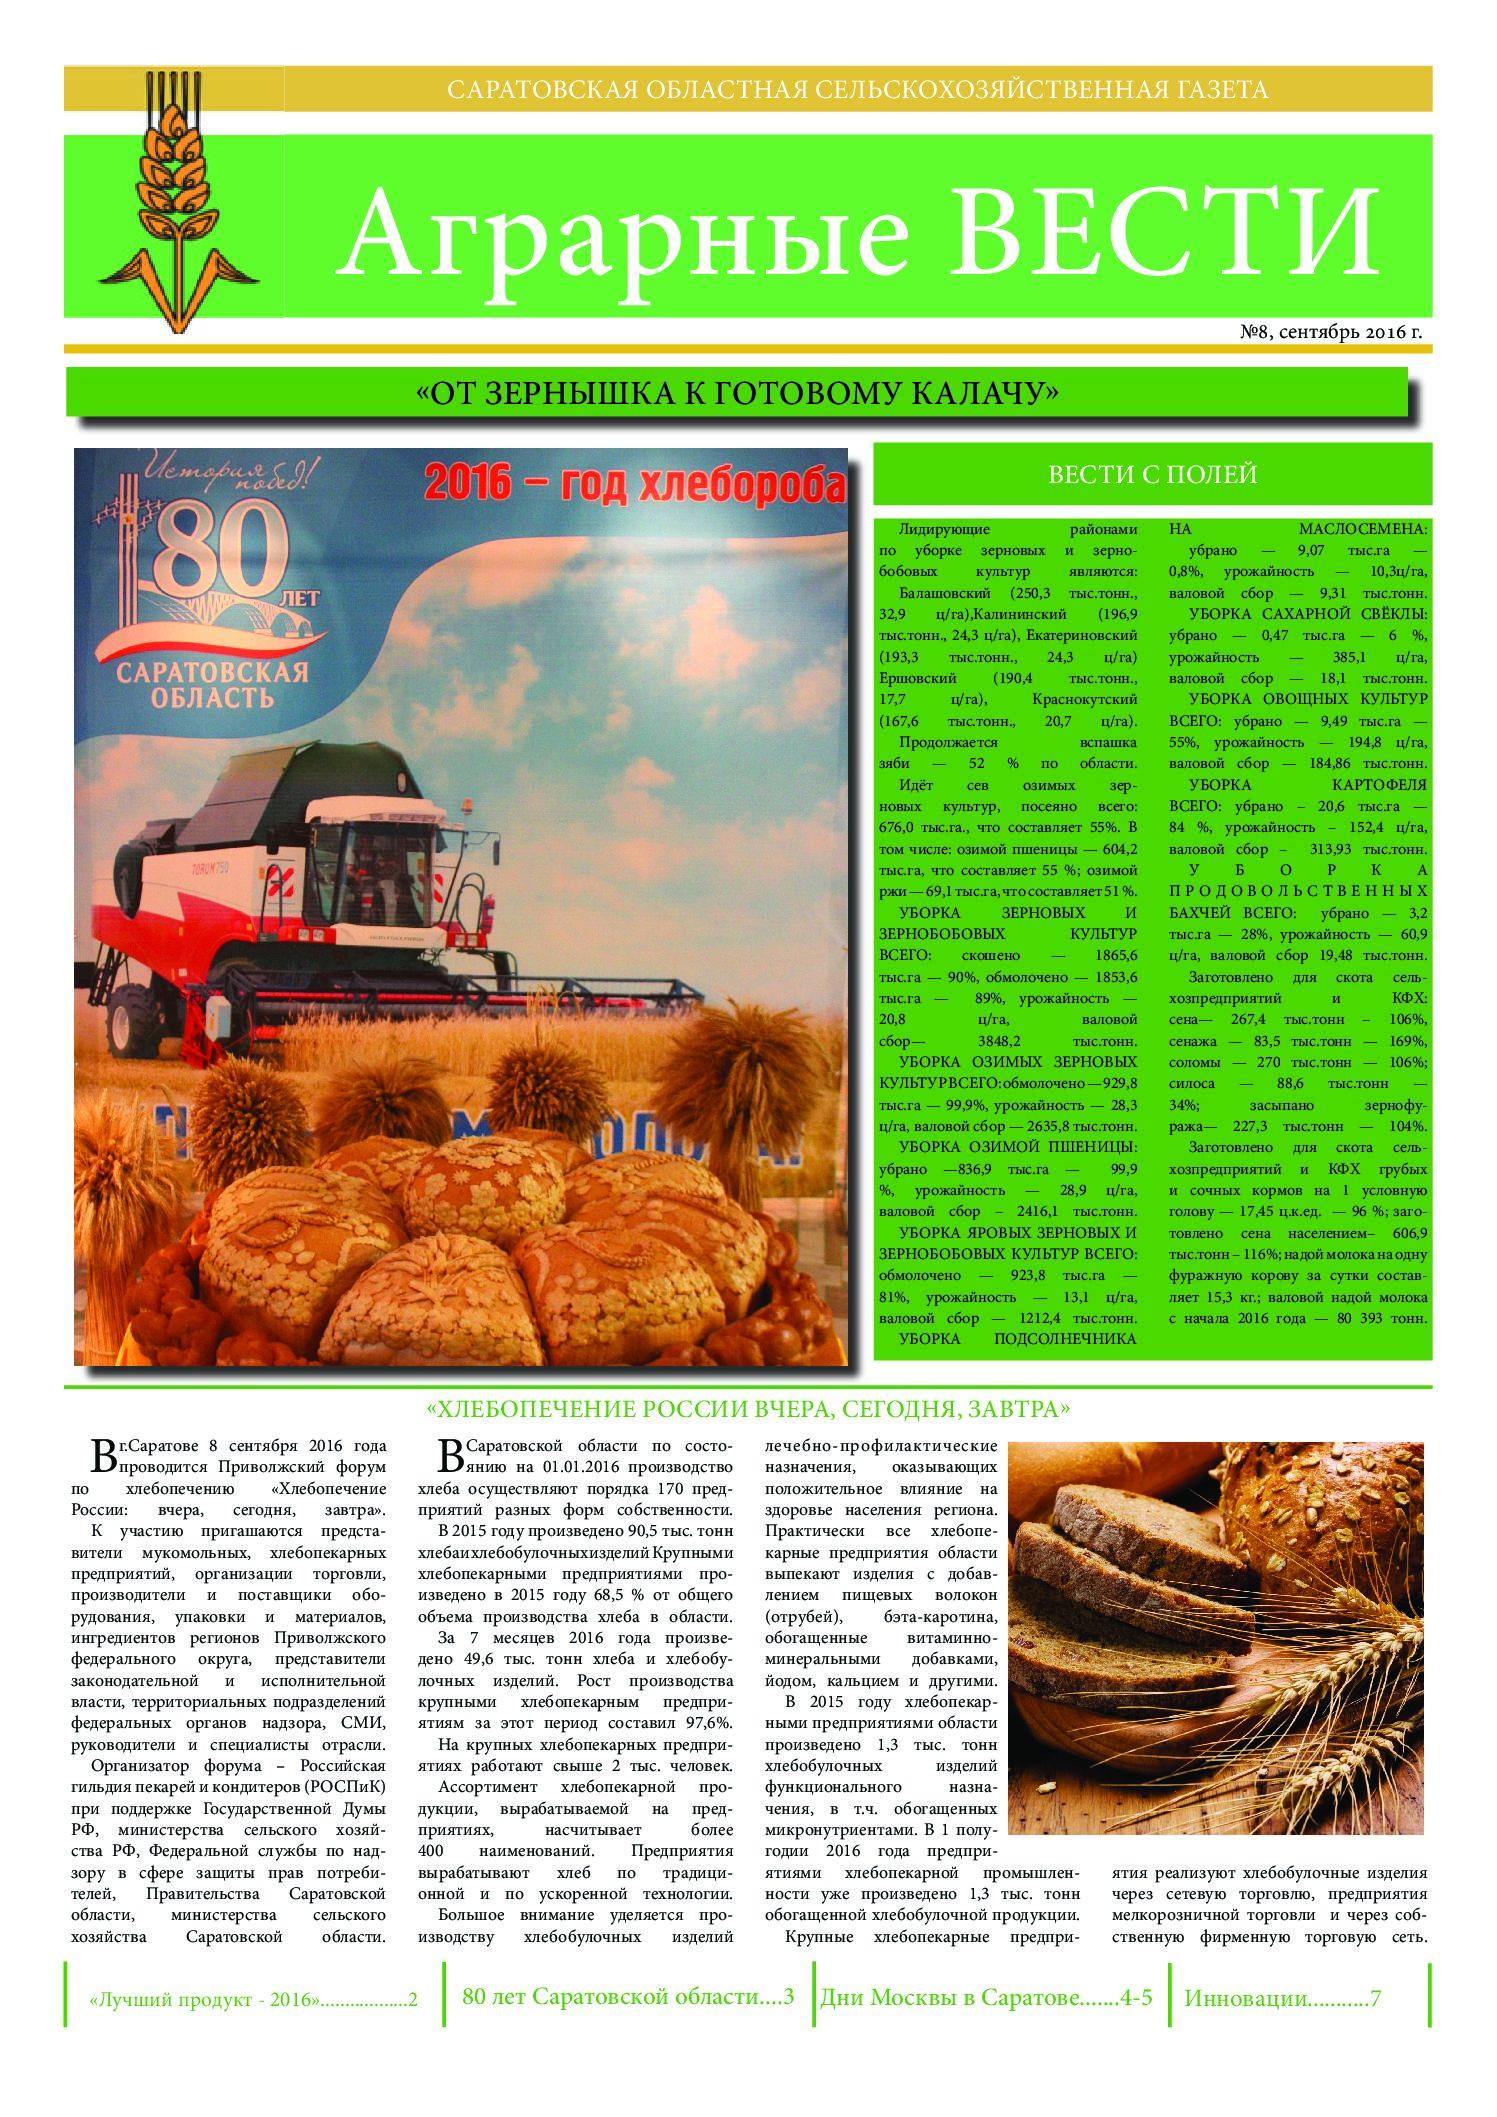 https://saratovagro.ru/wp-content/uploads/2020/08/сентябрь-pdf.jpg